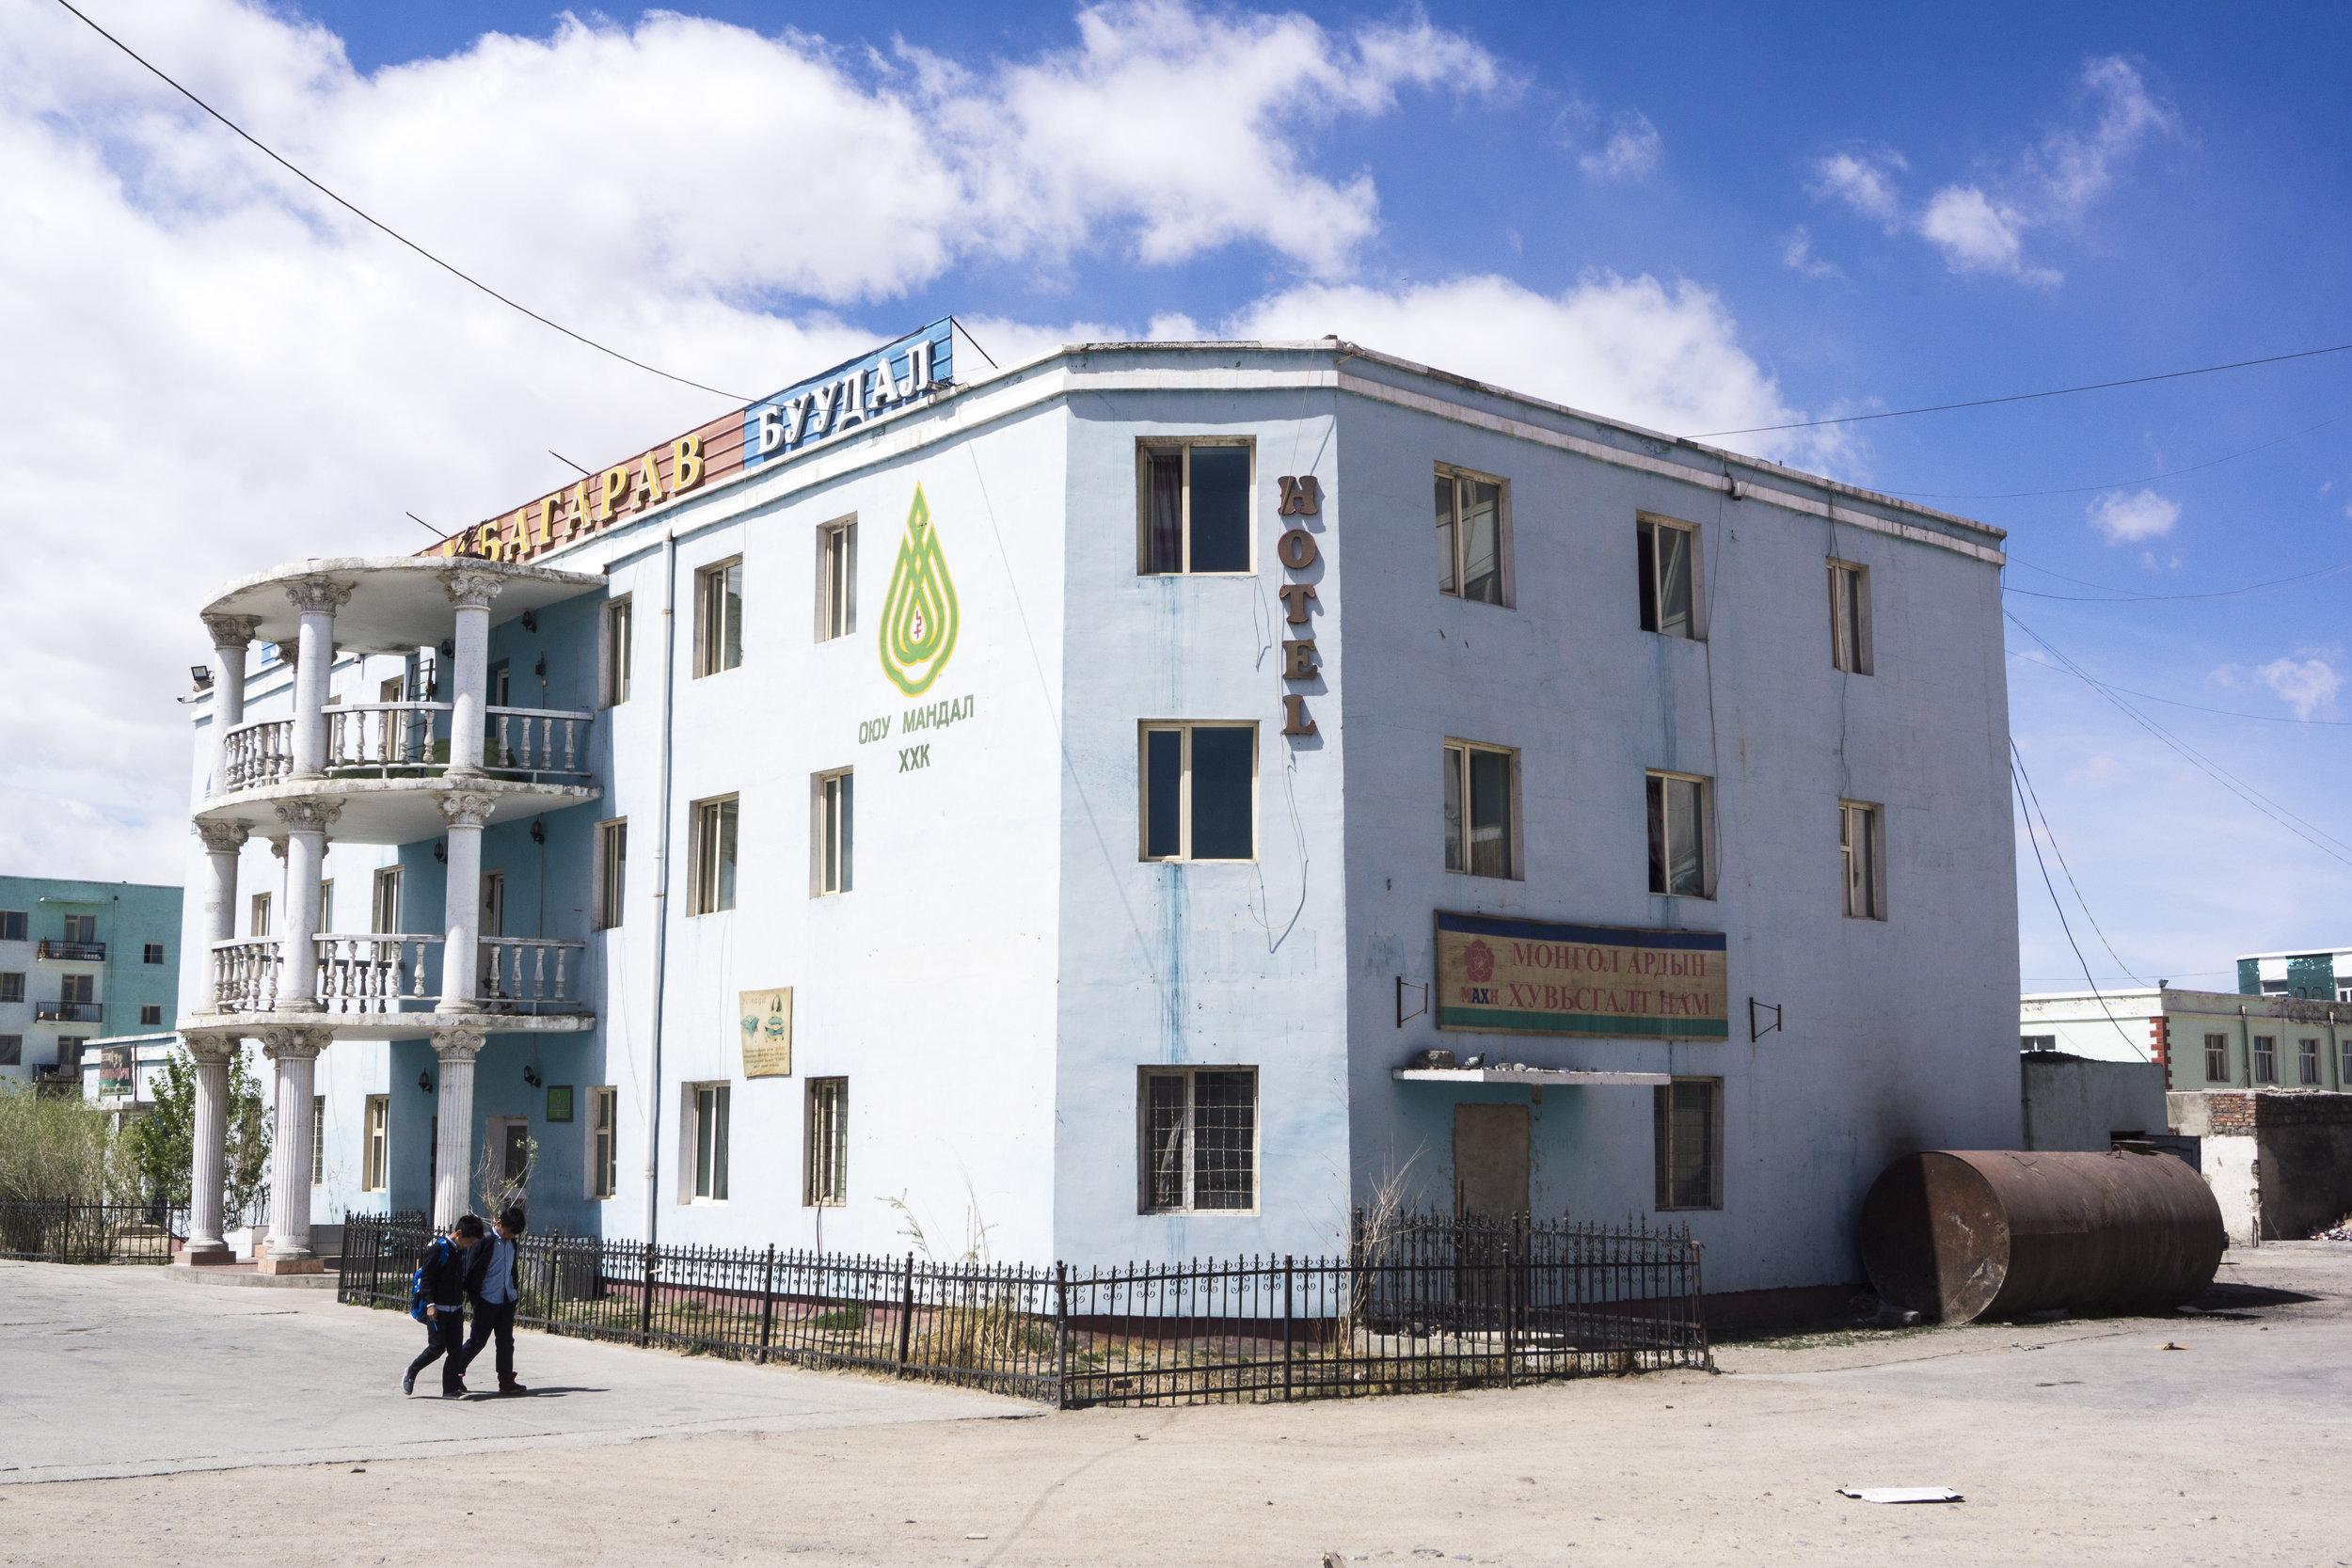 The Tsamgarav Hotel, Khovd.